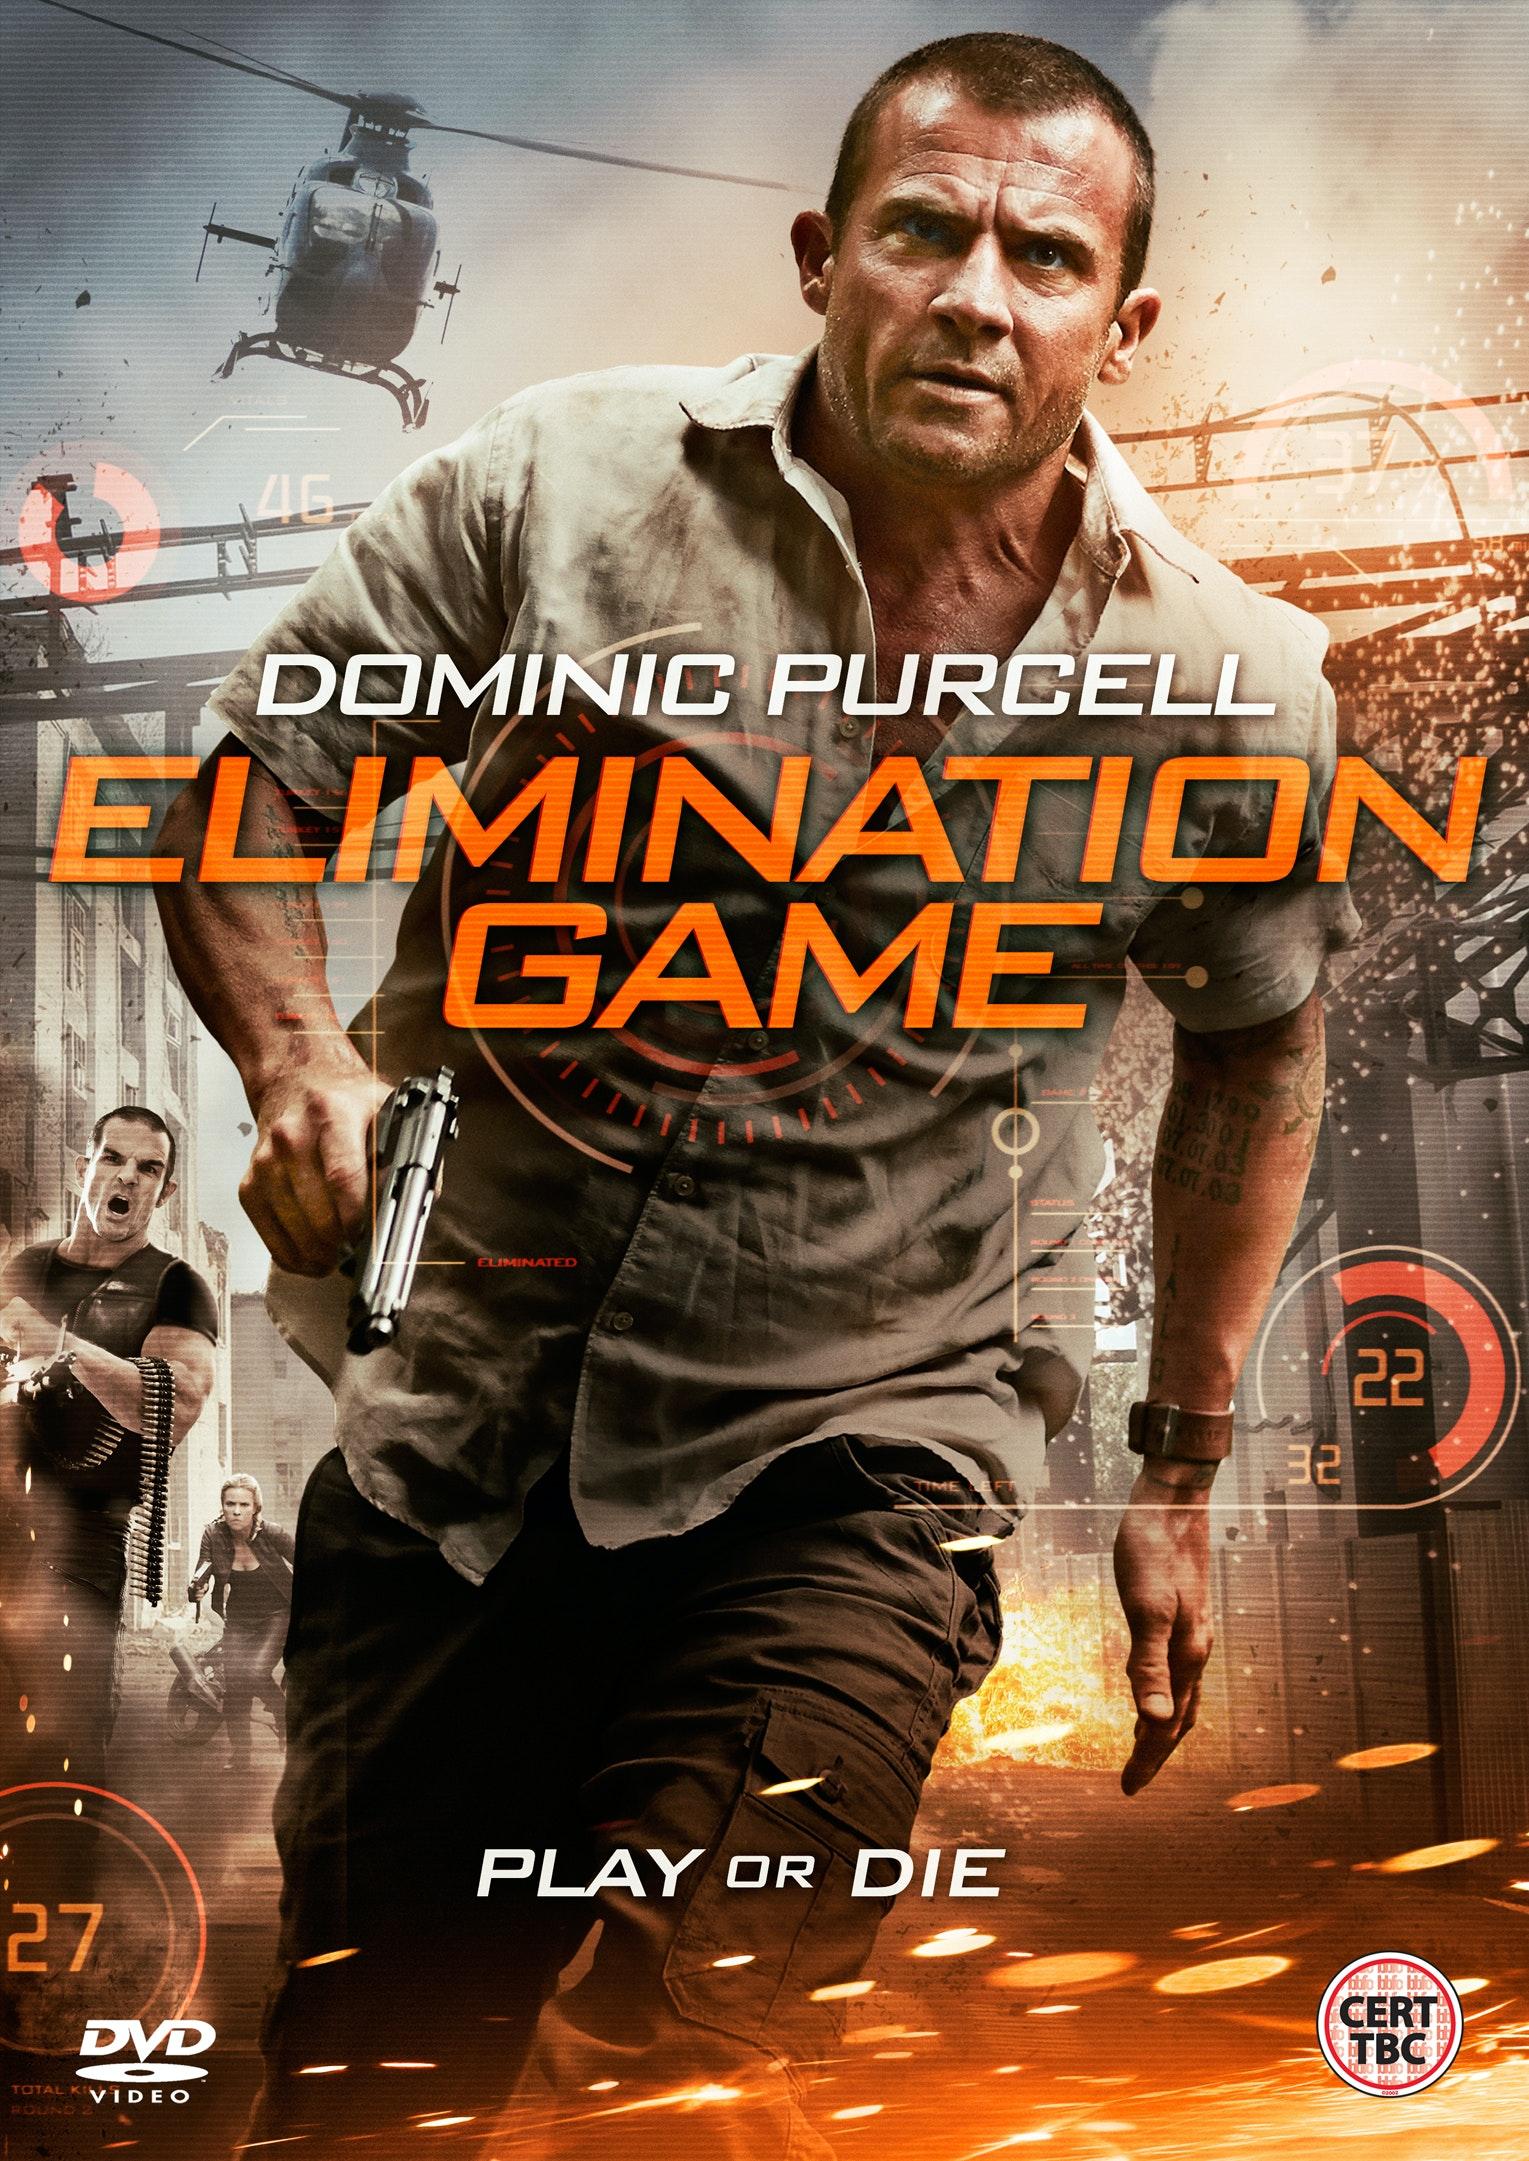 Elimination Game sweepstakes